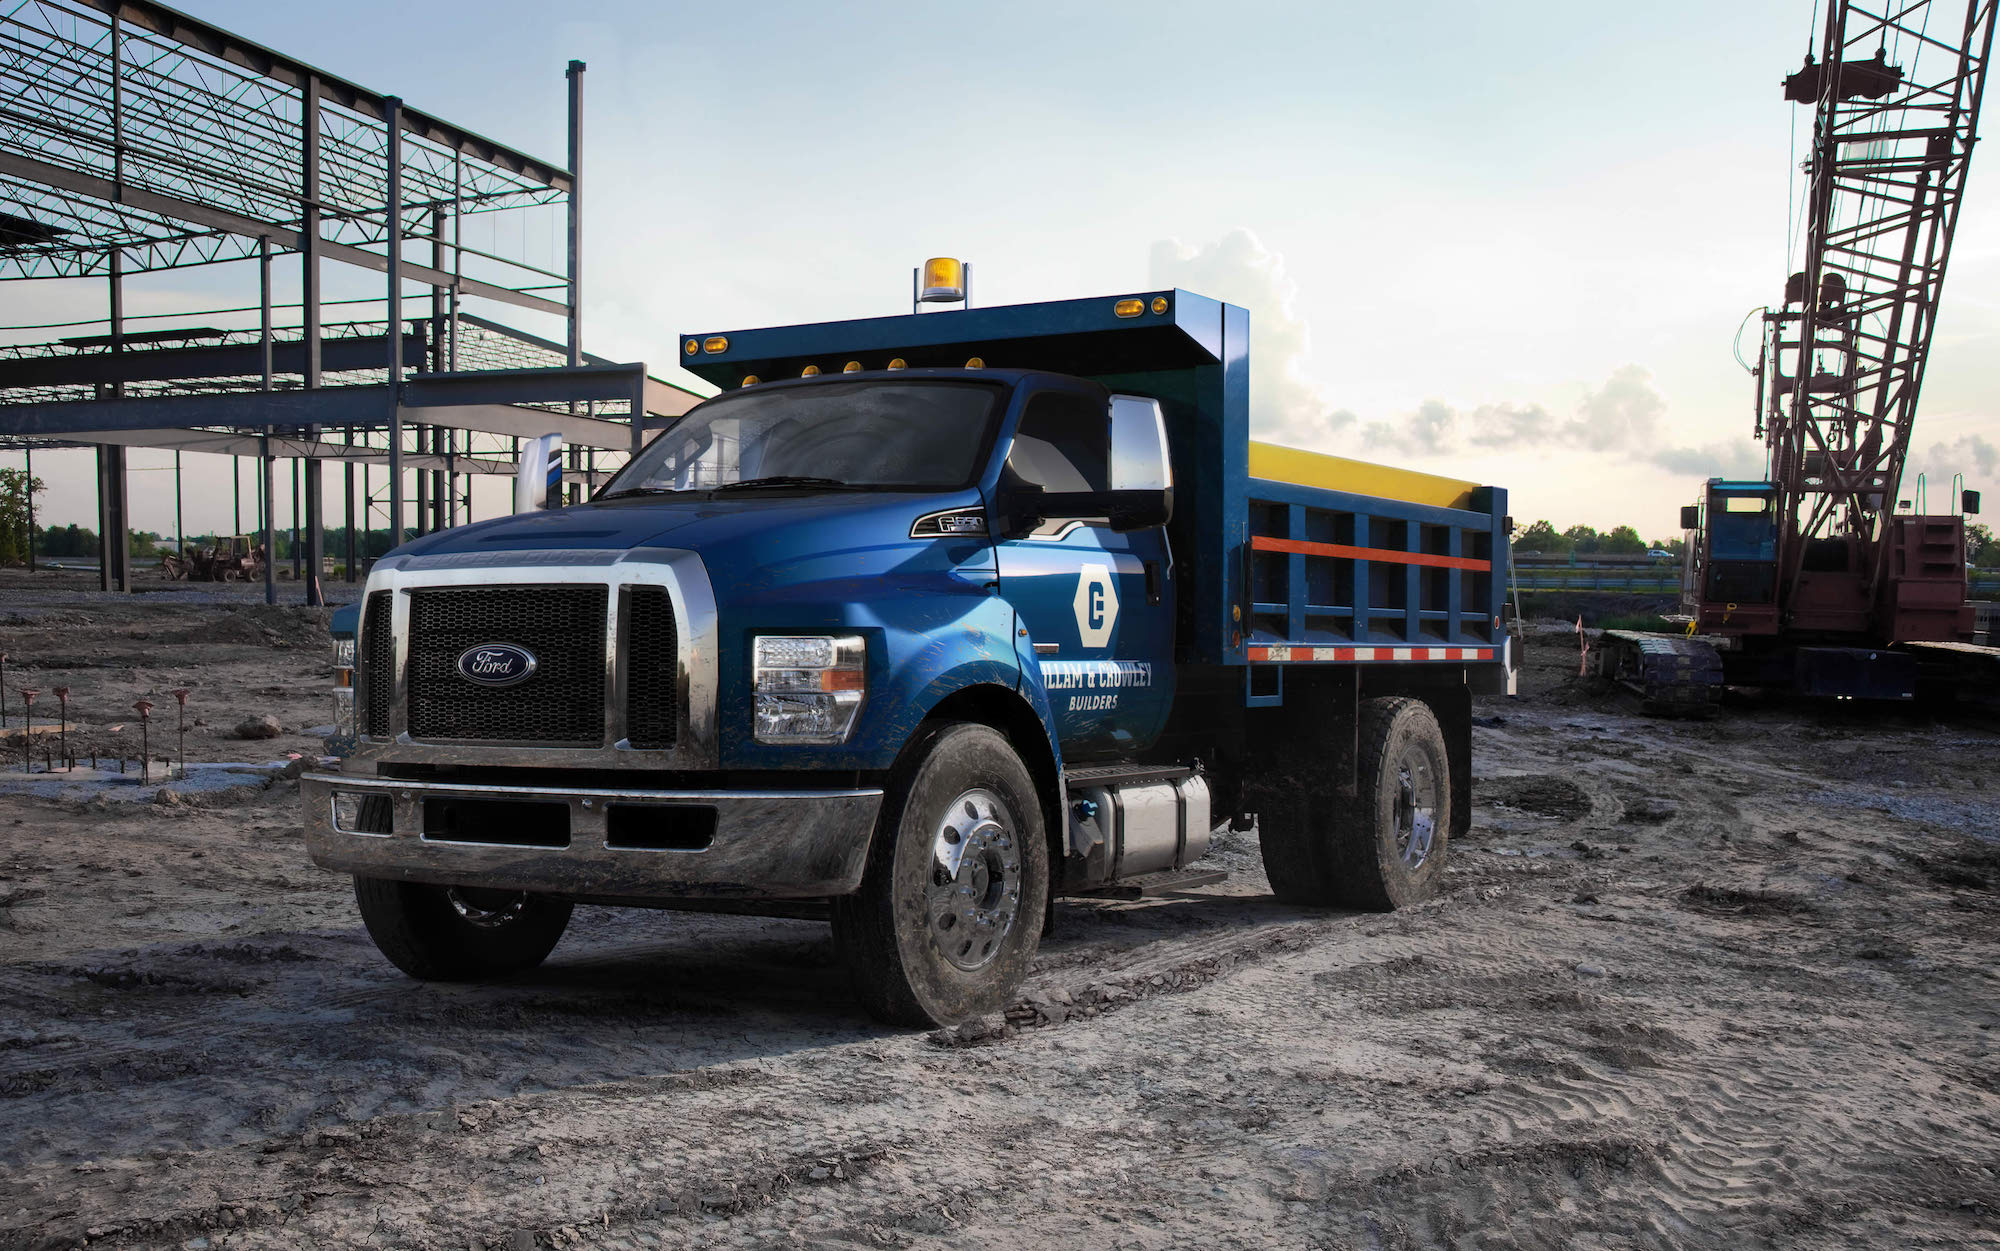 Build A Ford Truck >> Ford Volkswagen To Build Medium Duty Trucks Vans In New Partnership